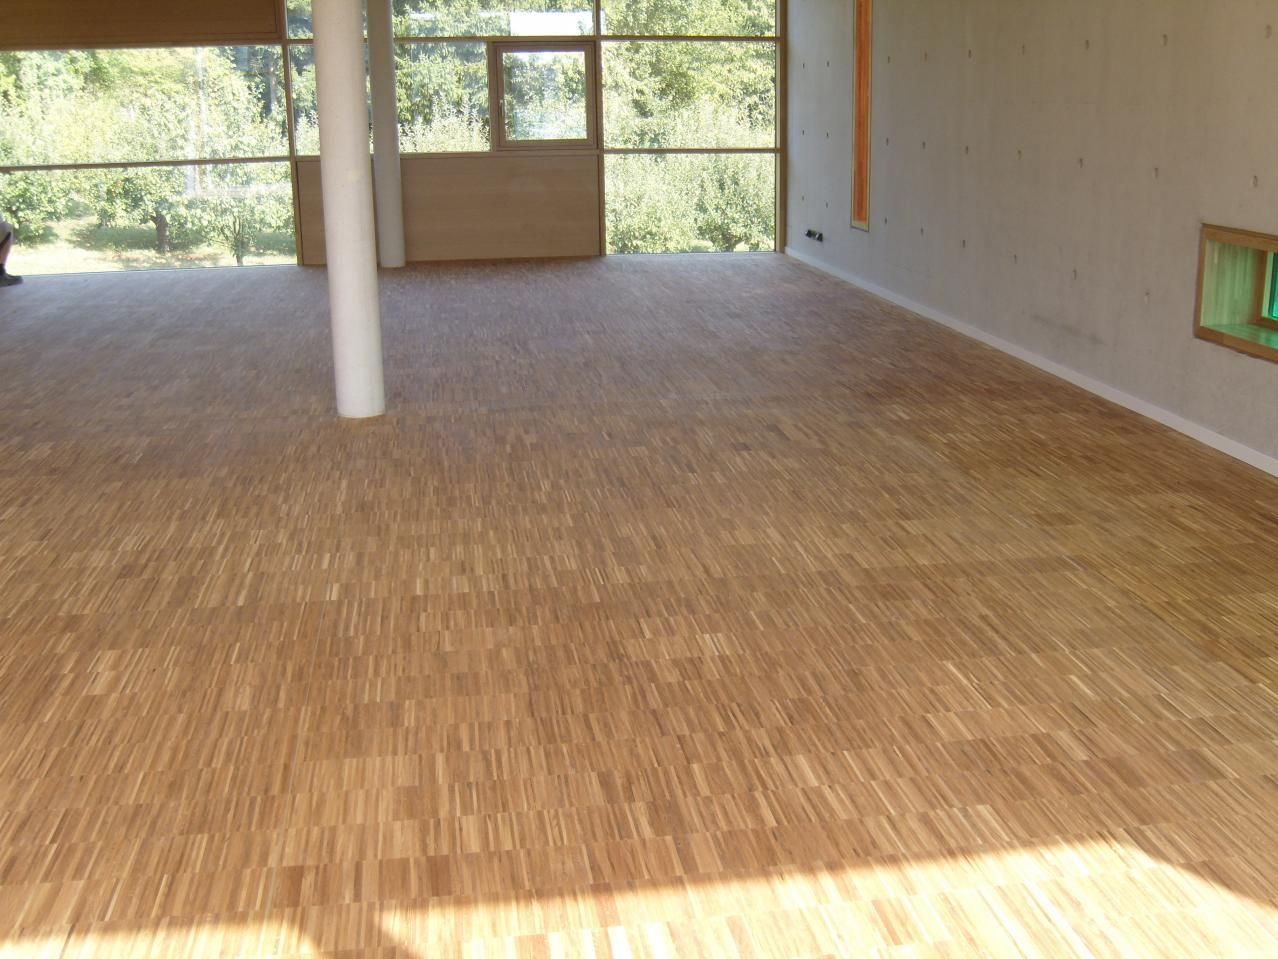 industrial parquet flooring laminate Google Search